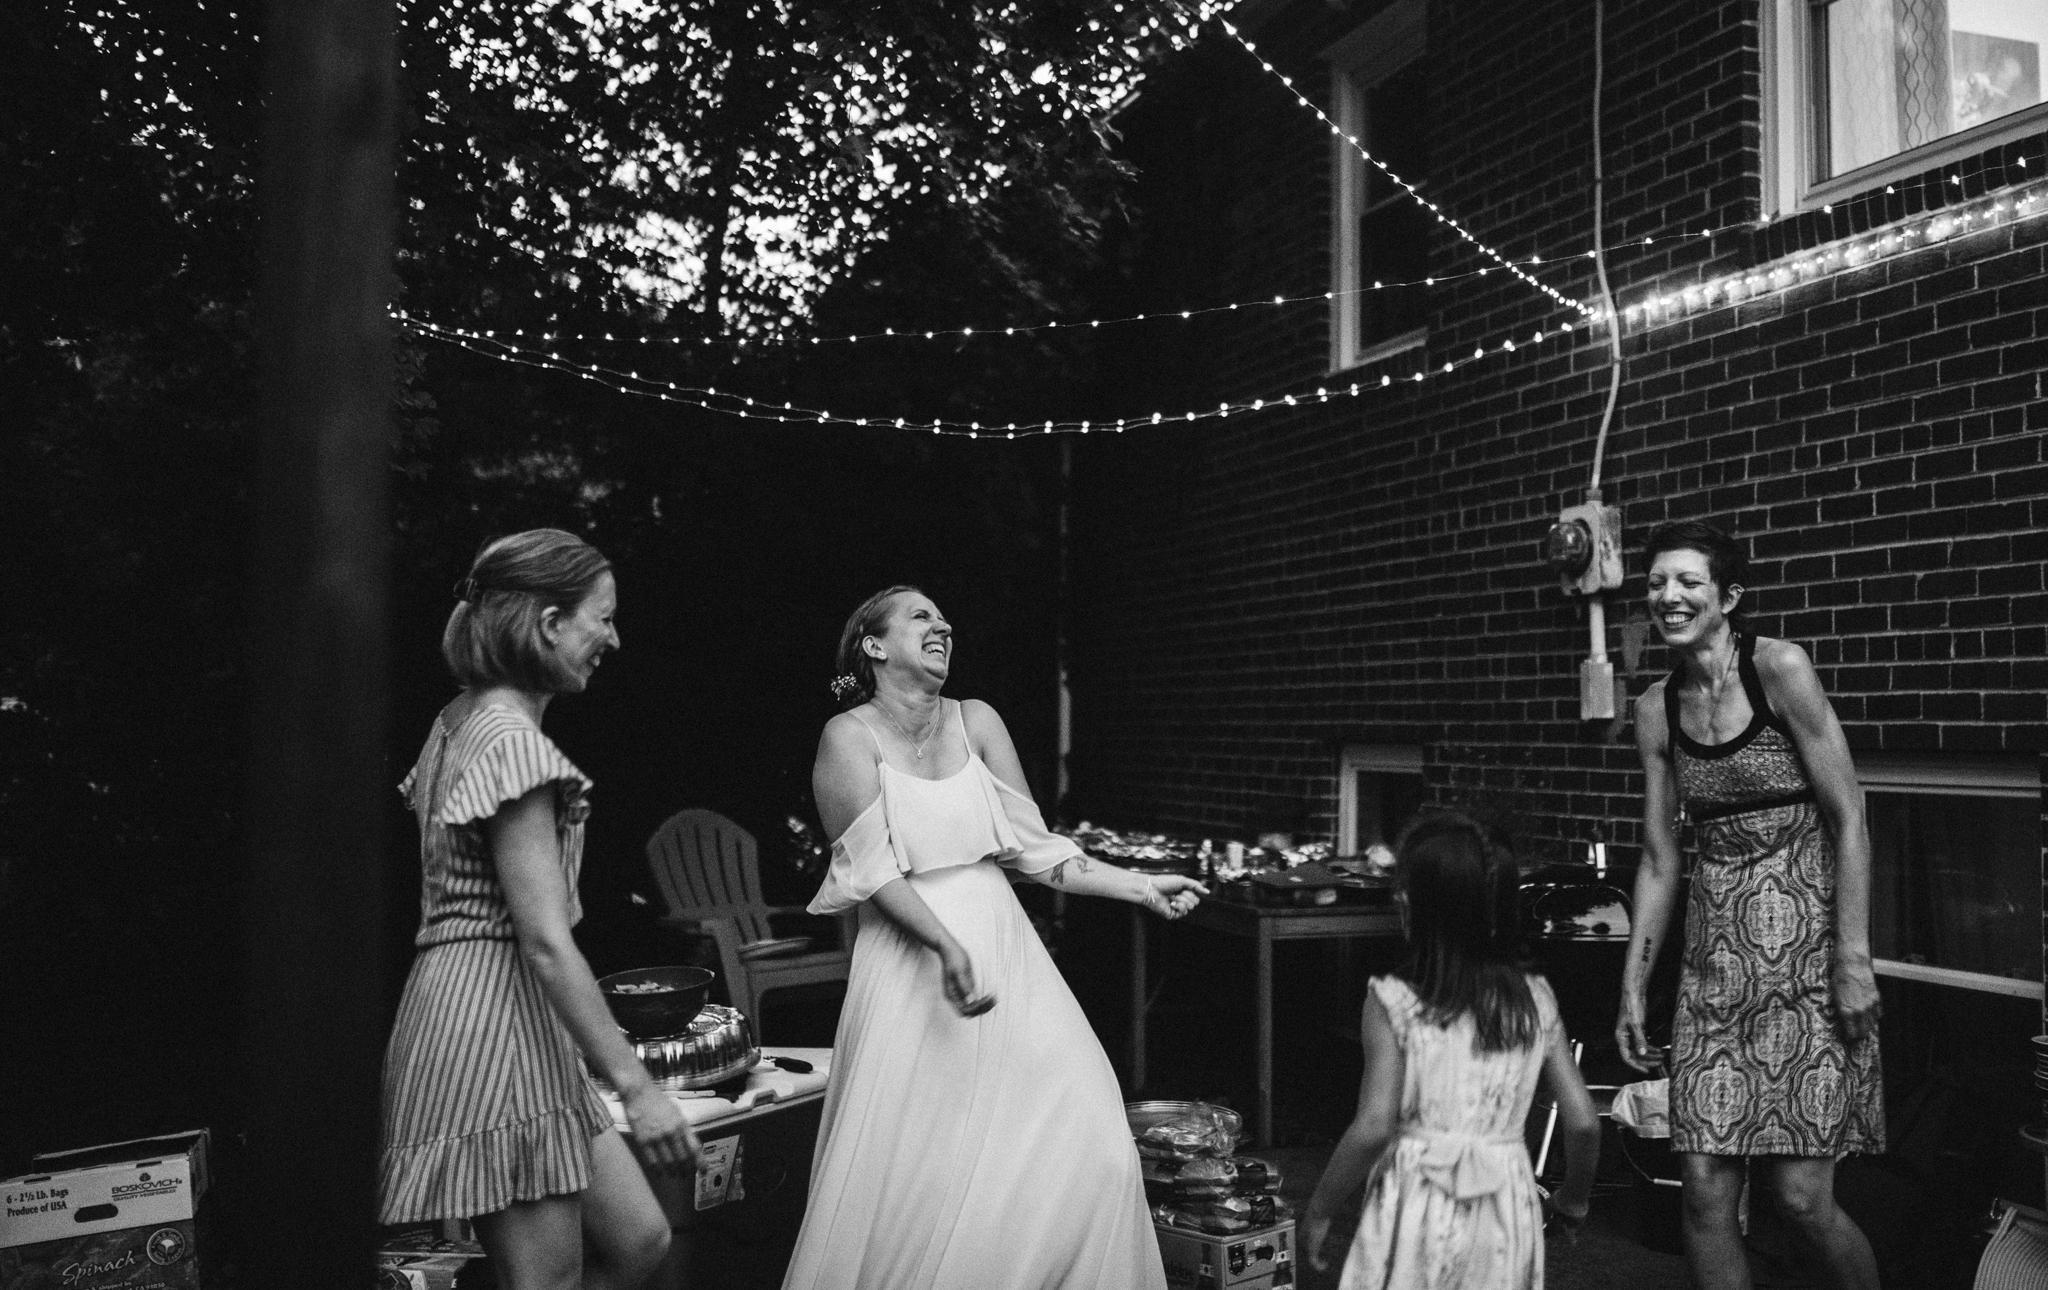 dorota_dwight_richmond_backyard_wedding-114.jpg